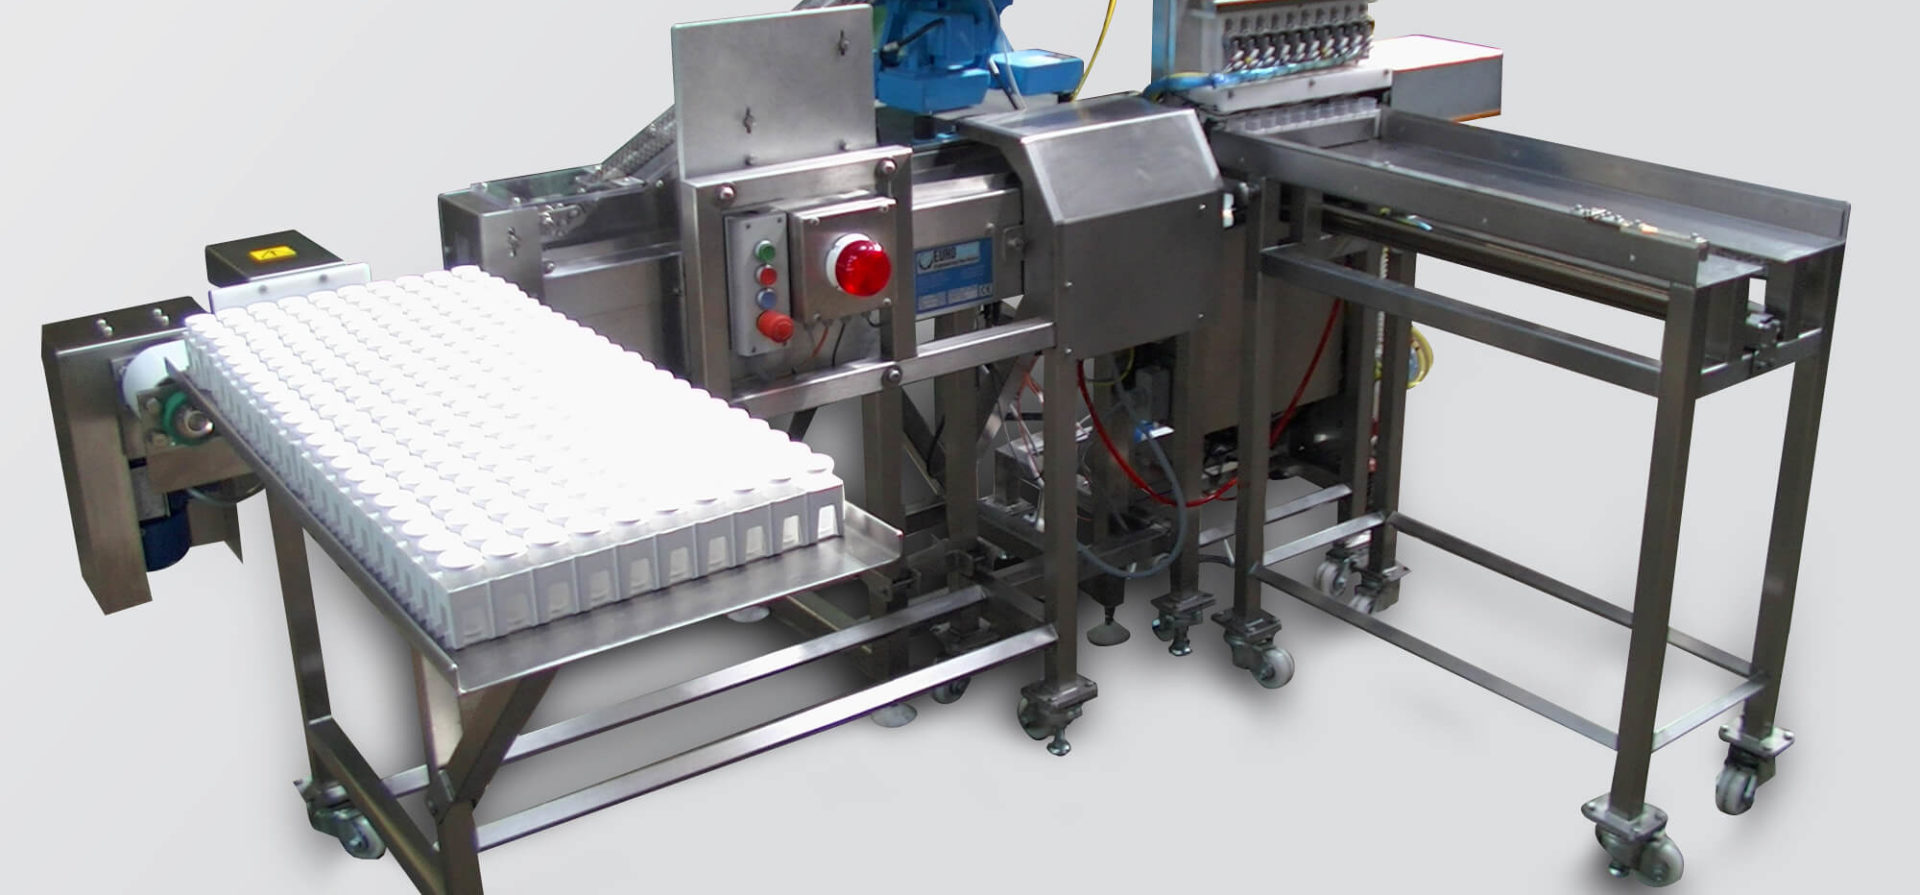 Quality Milk Case Study | Euroflow Automation Ltd